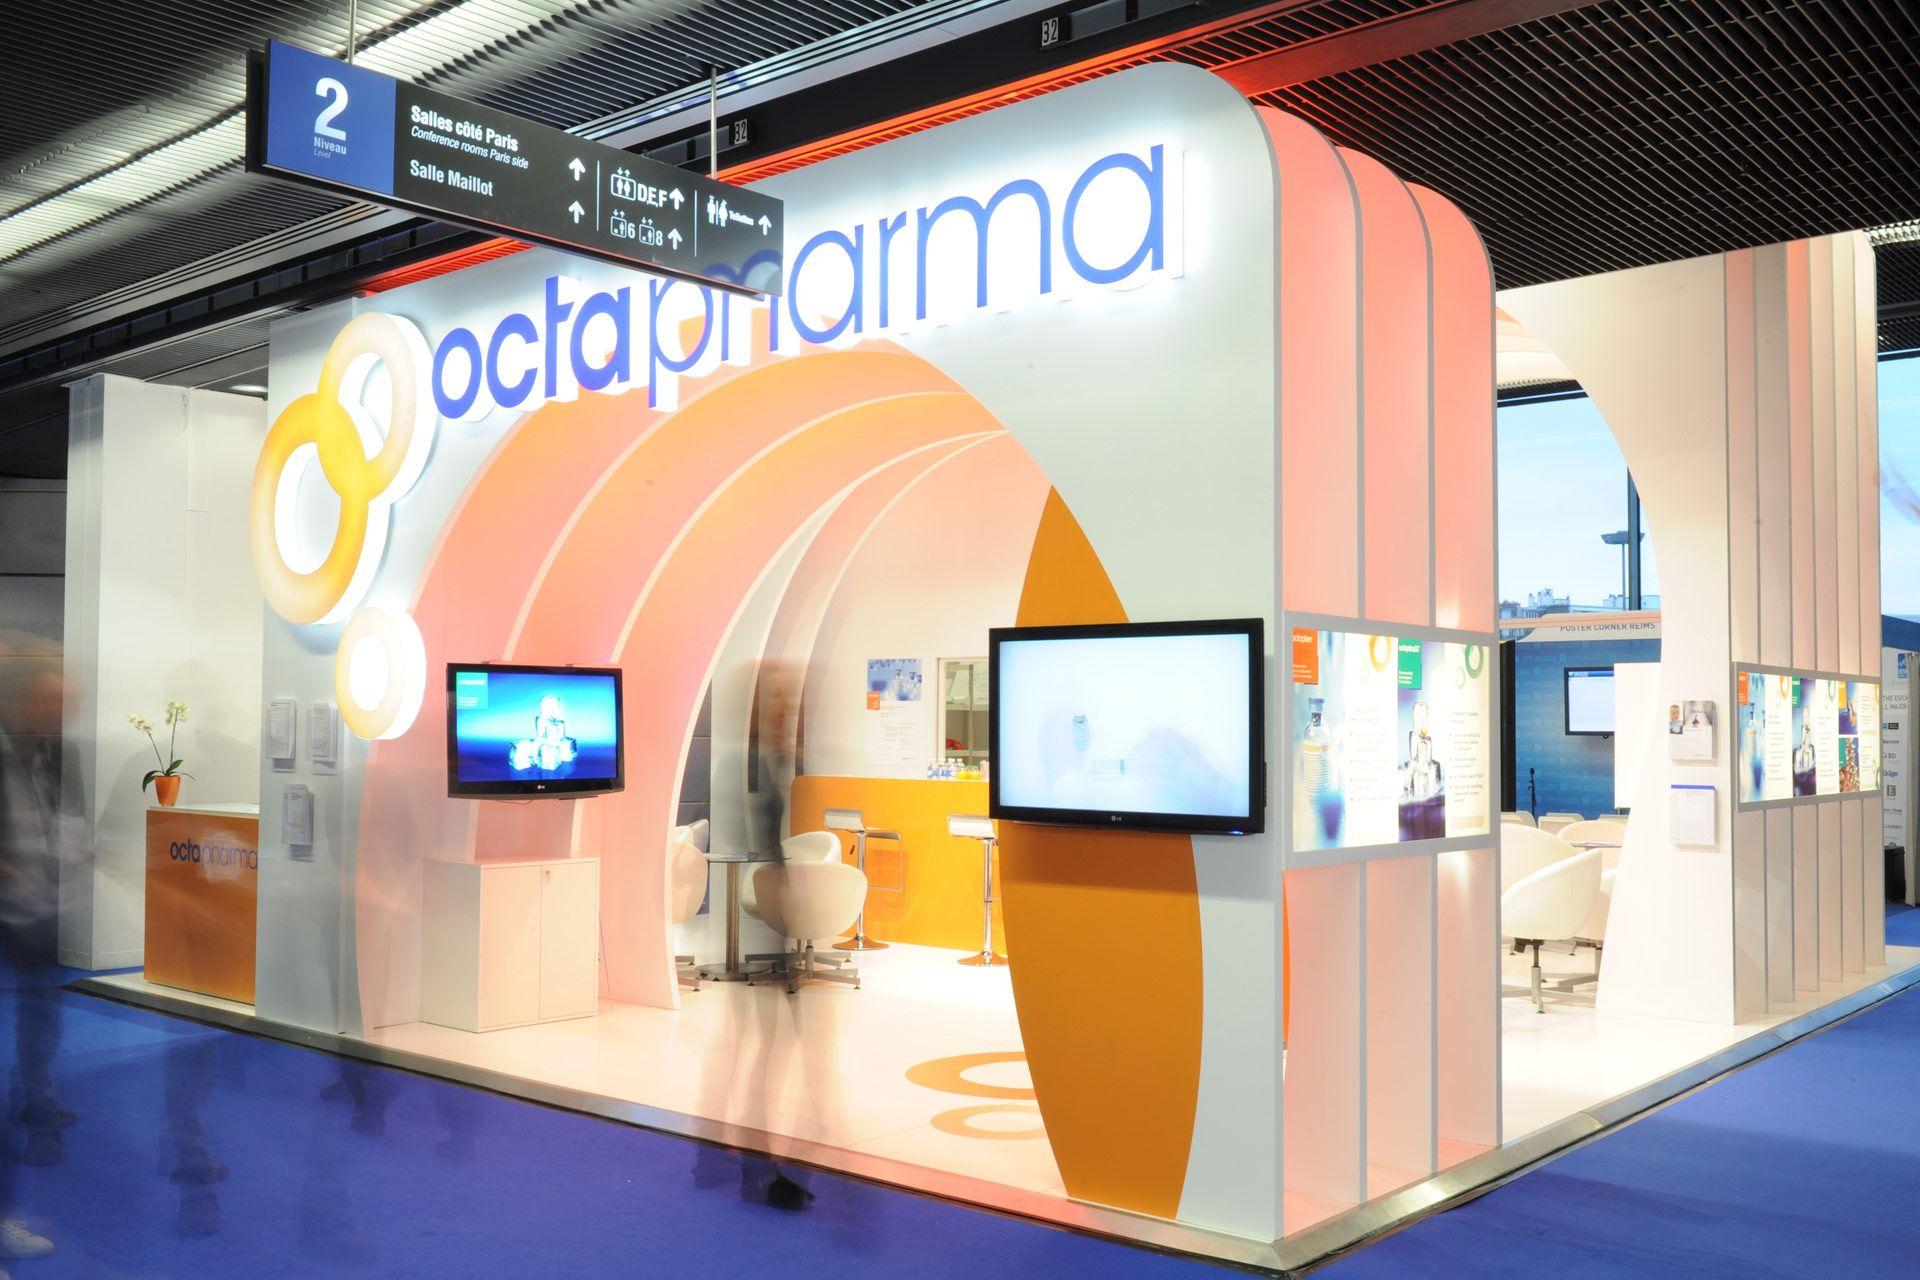 octapharma esicm paris 2013 pro expo exhibition stand design building we provided efficient. Black Bedroom Furniture Sets. Home Design Ideas